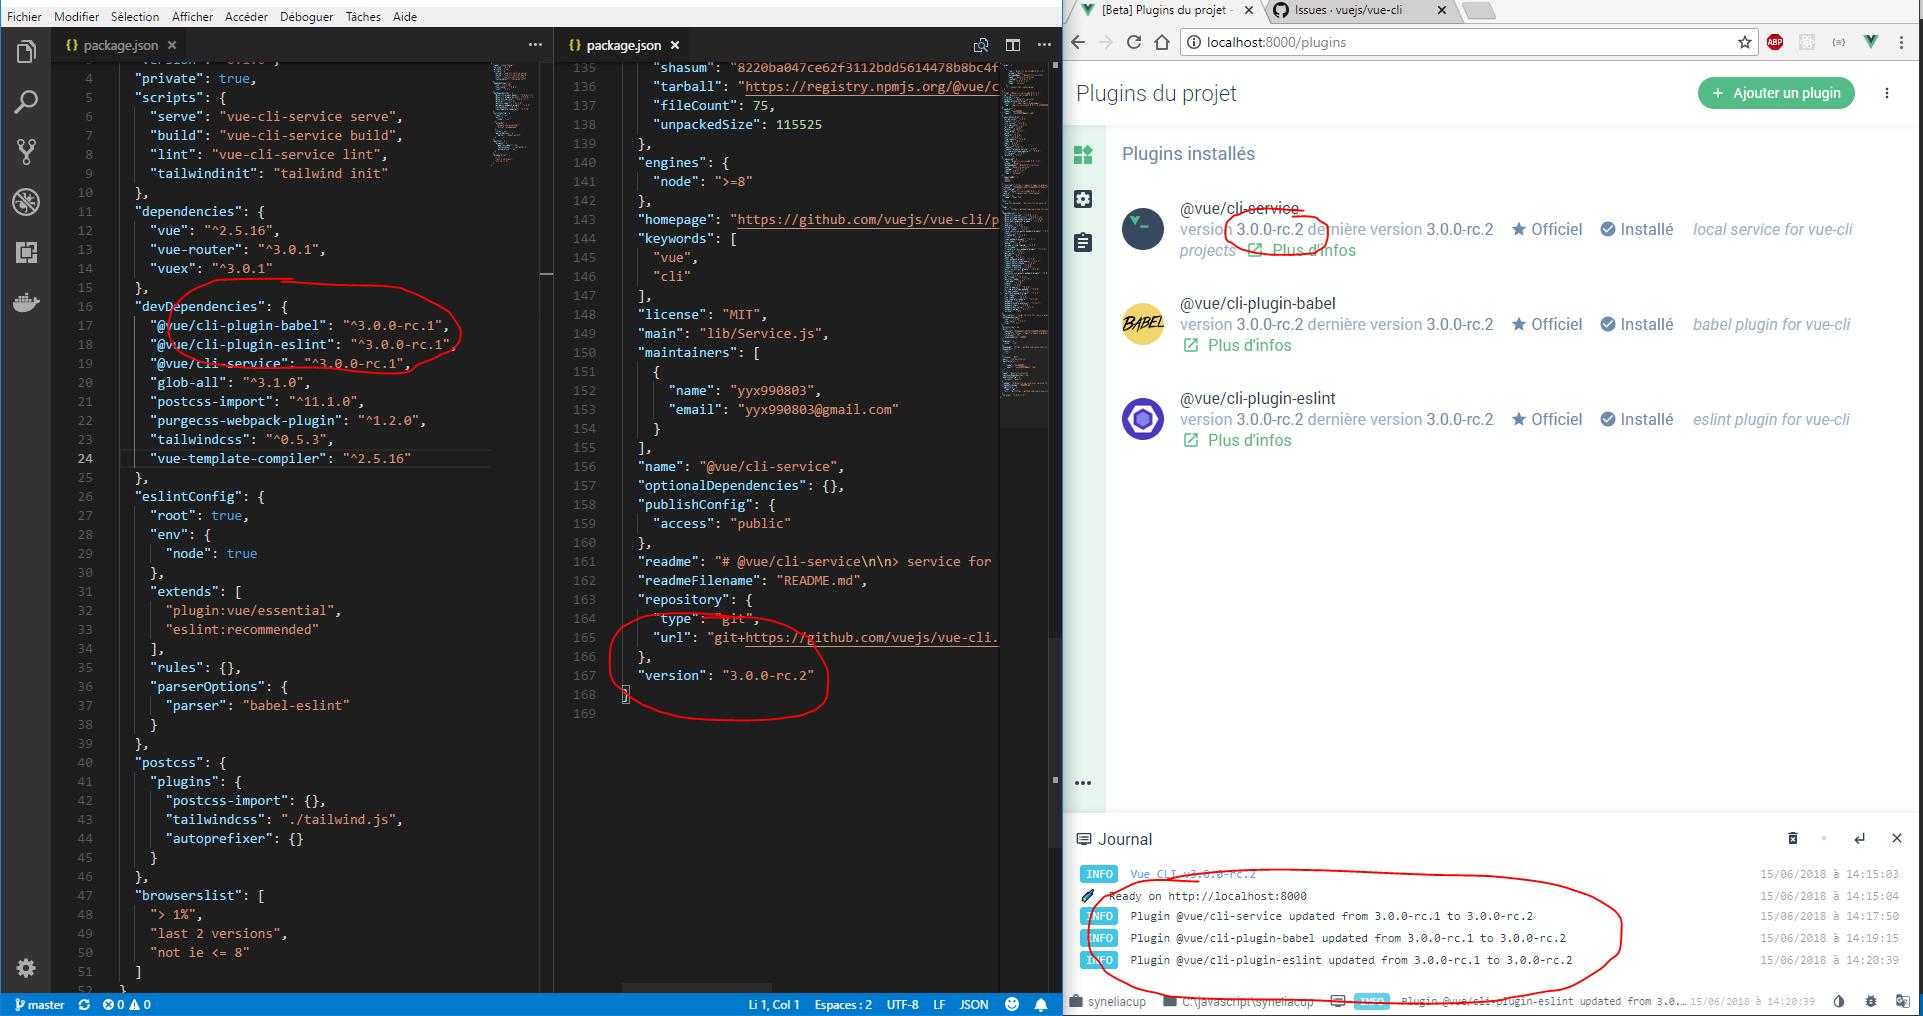 ui] update cli-service package json · Issue #1580 · vuejs